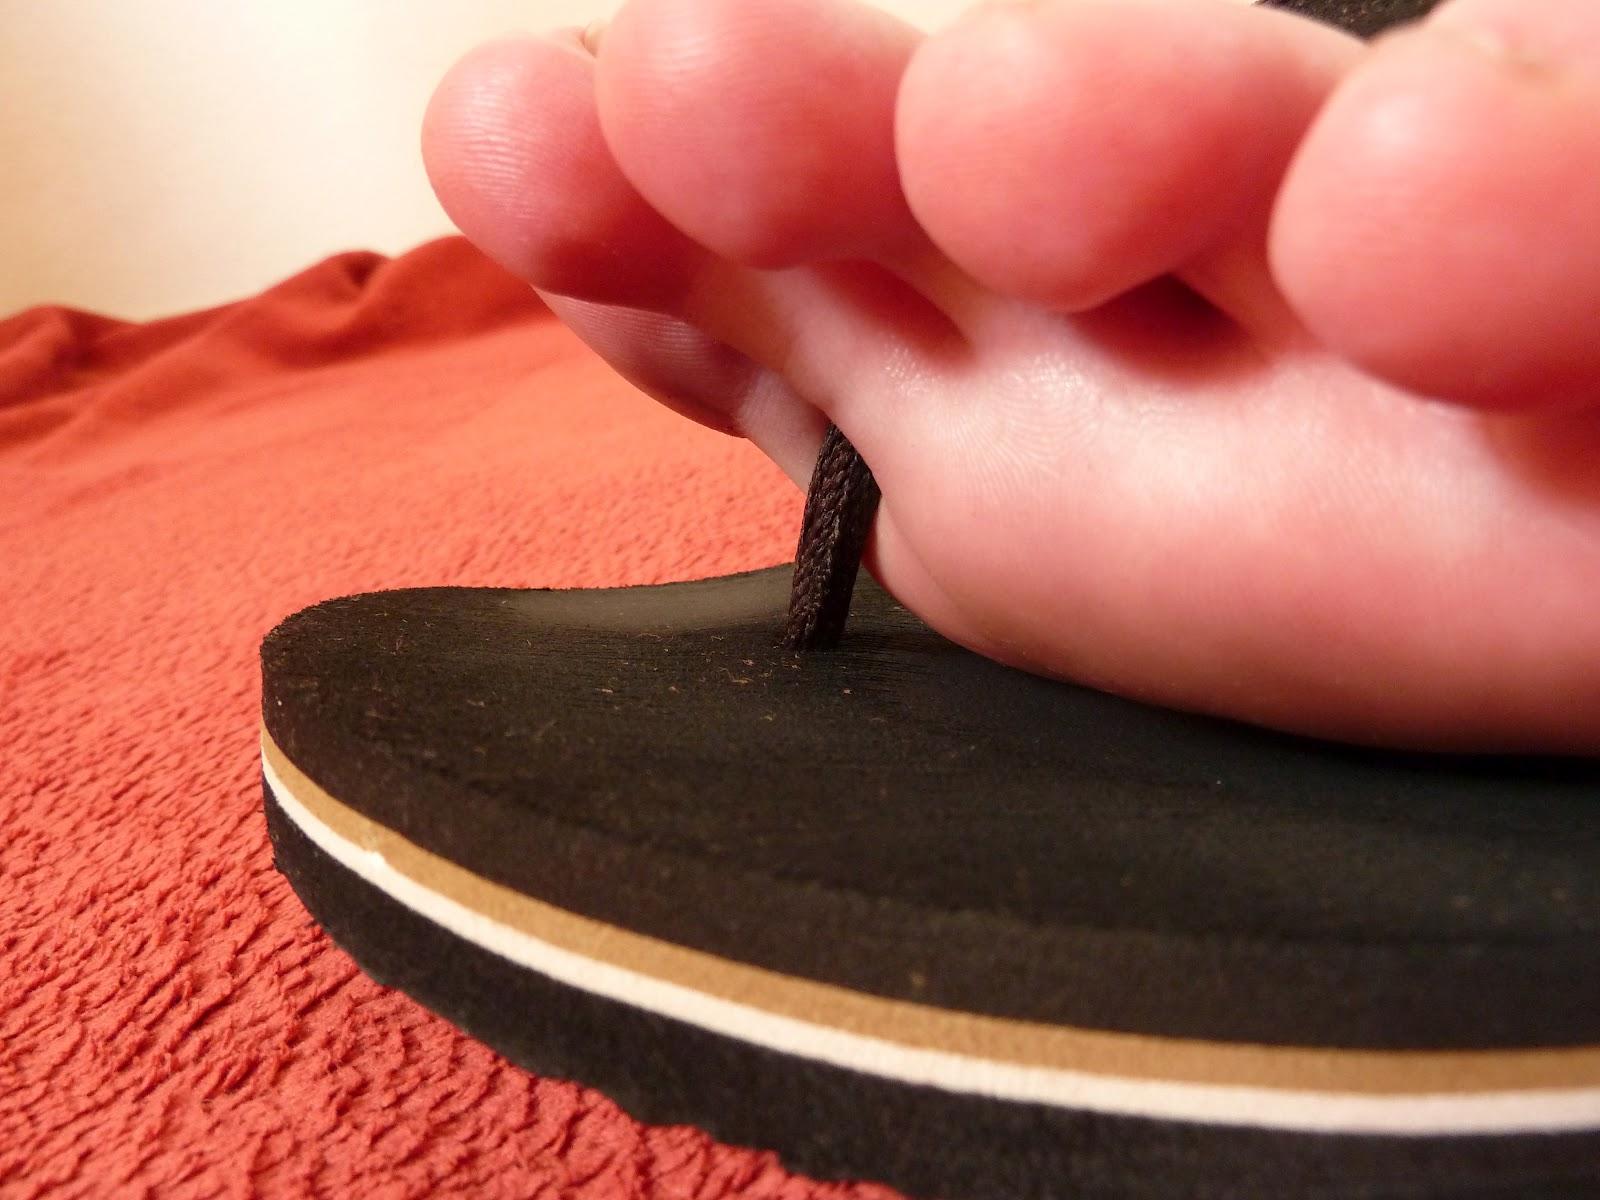 4e7d0be3328d7 Holey soles coursework service jpg 1600x1200 Holey soles clogs